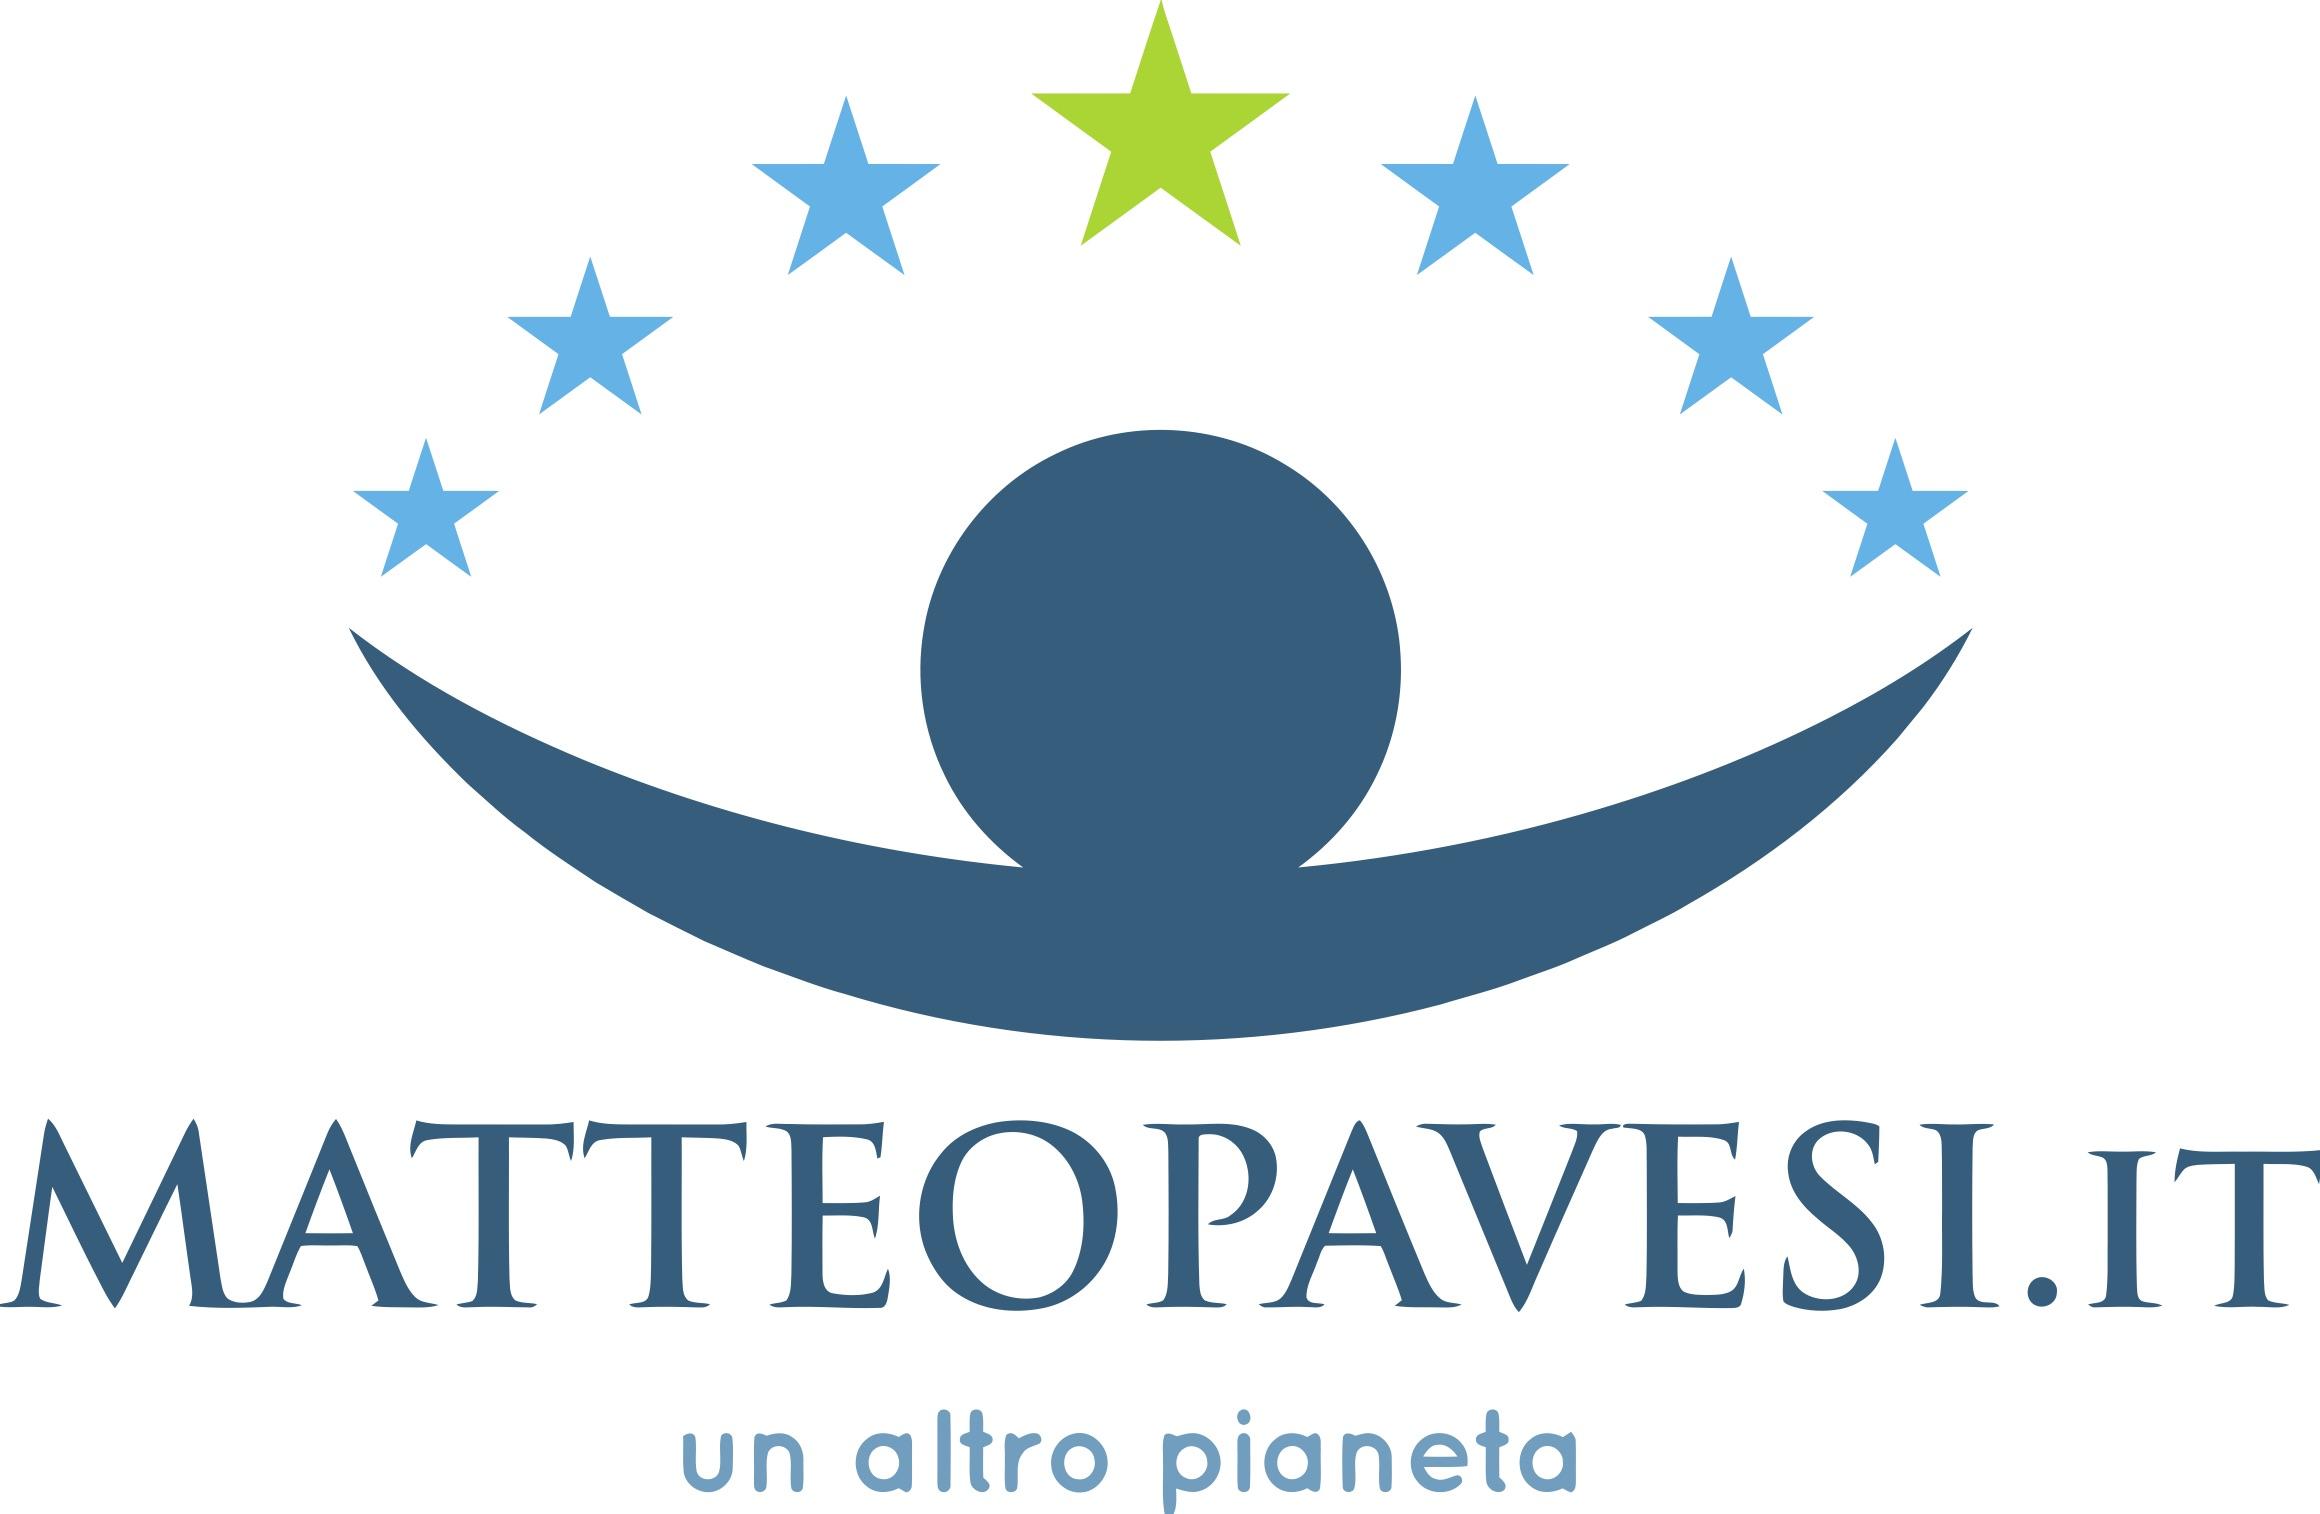 Matteo Pavesi - astrologo scrittore